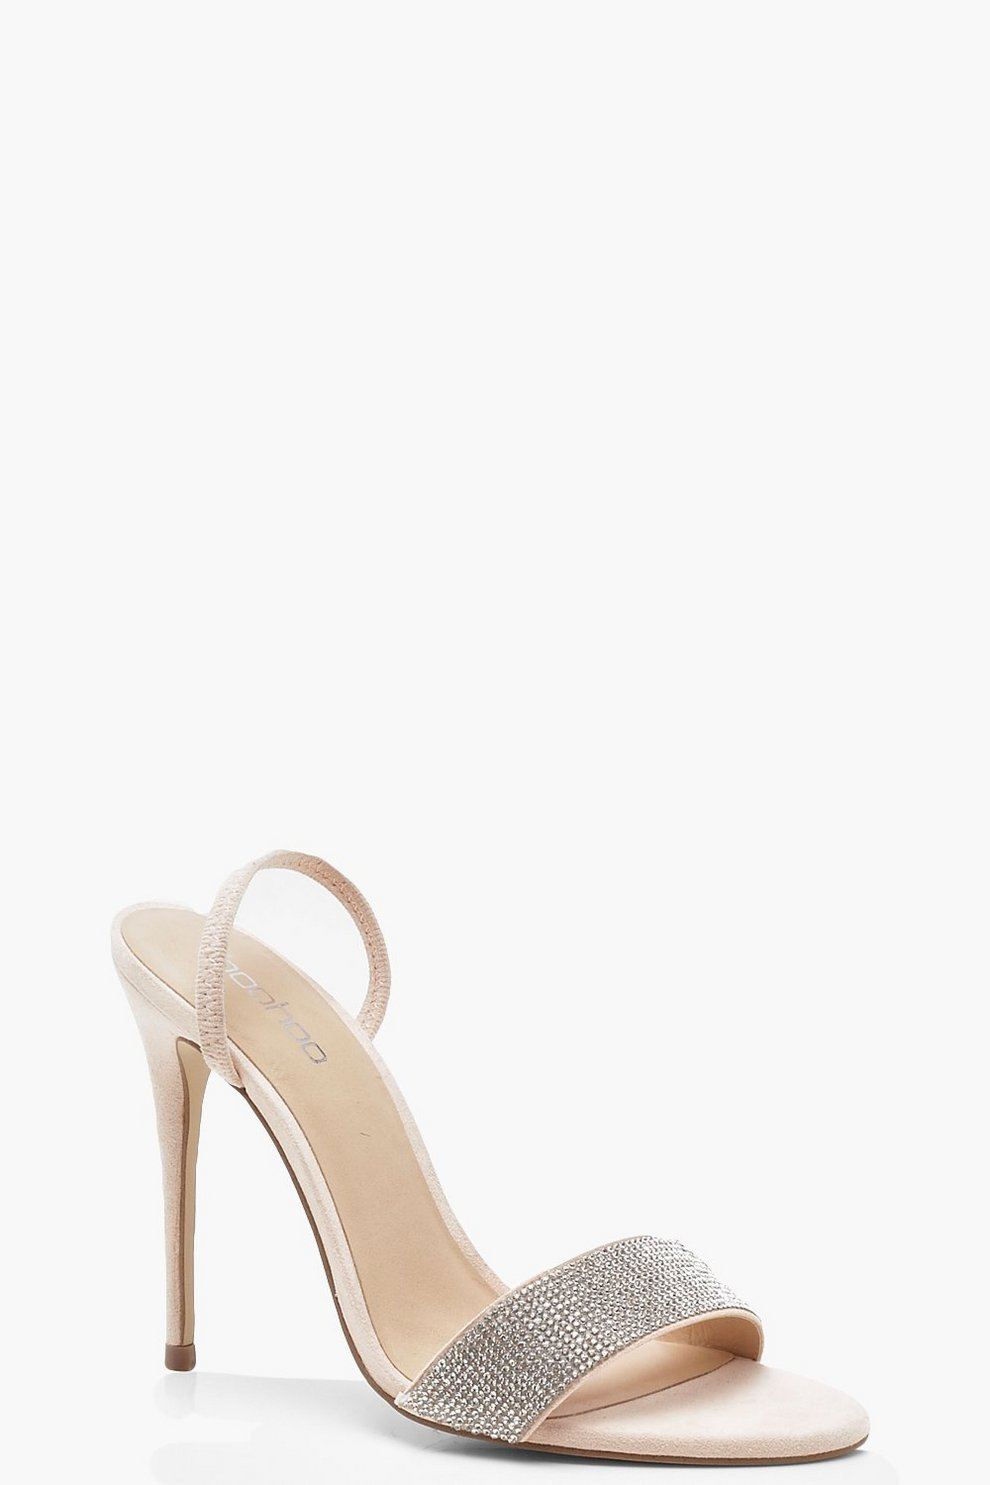 1773d662375f Diamante Strap Sling Back Heel Sandals